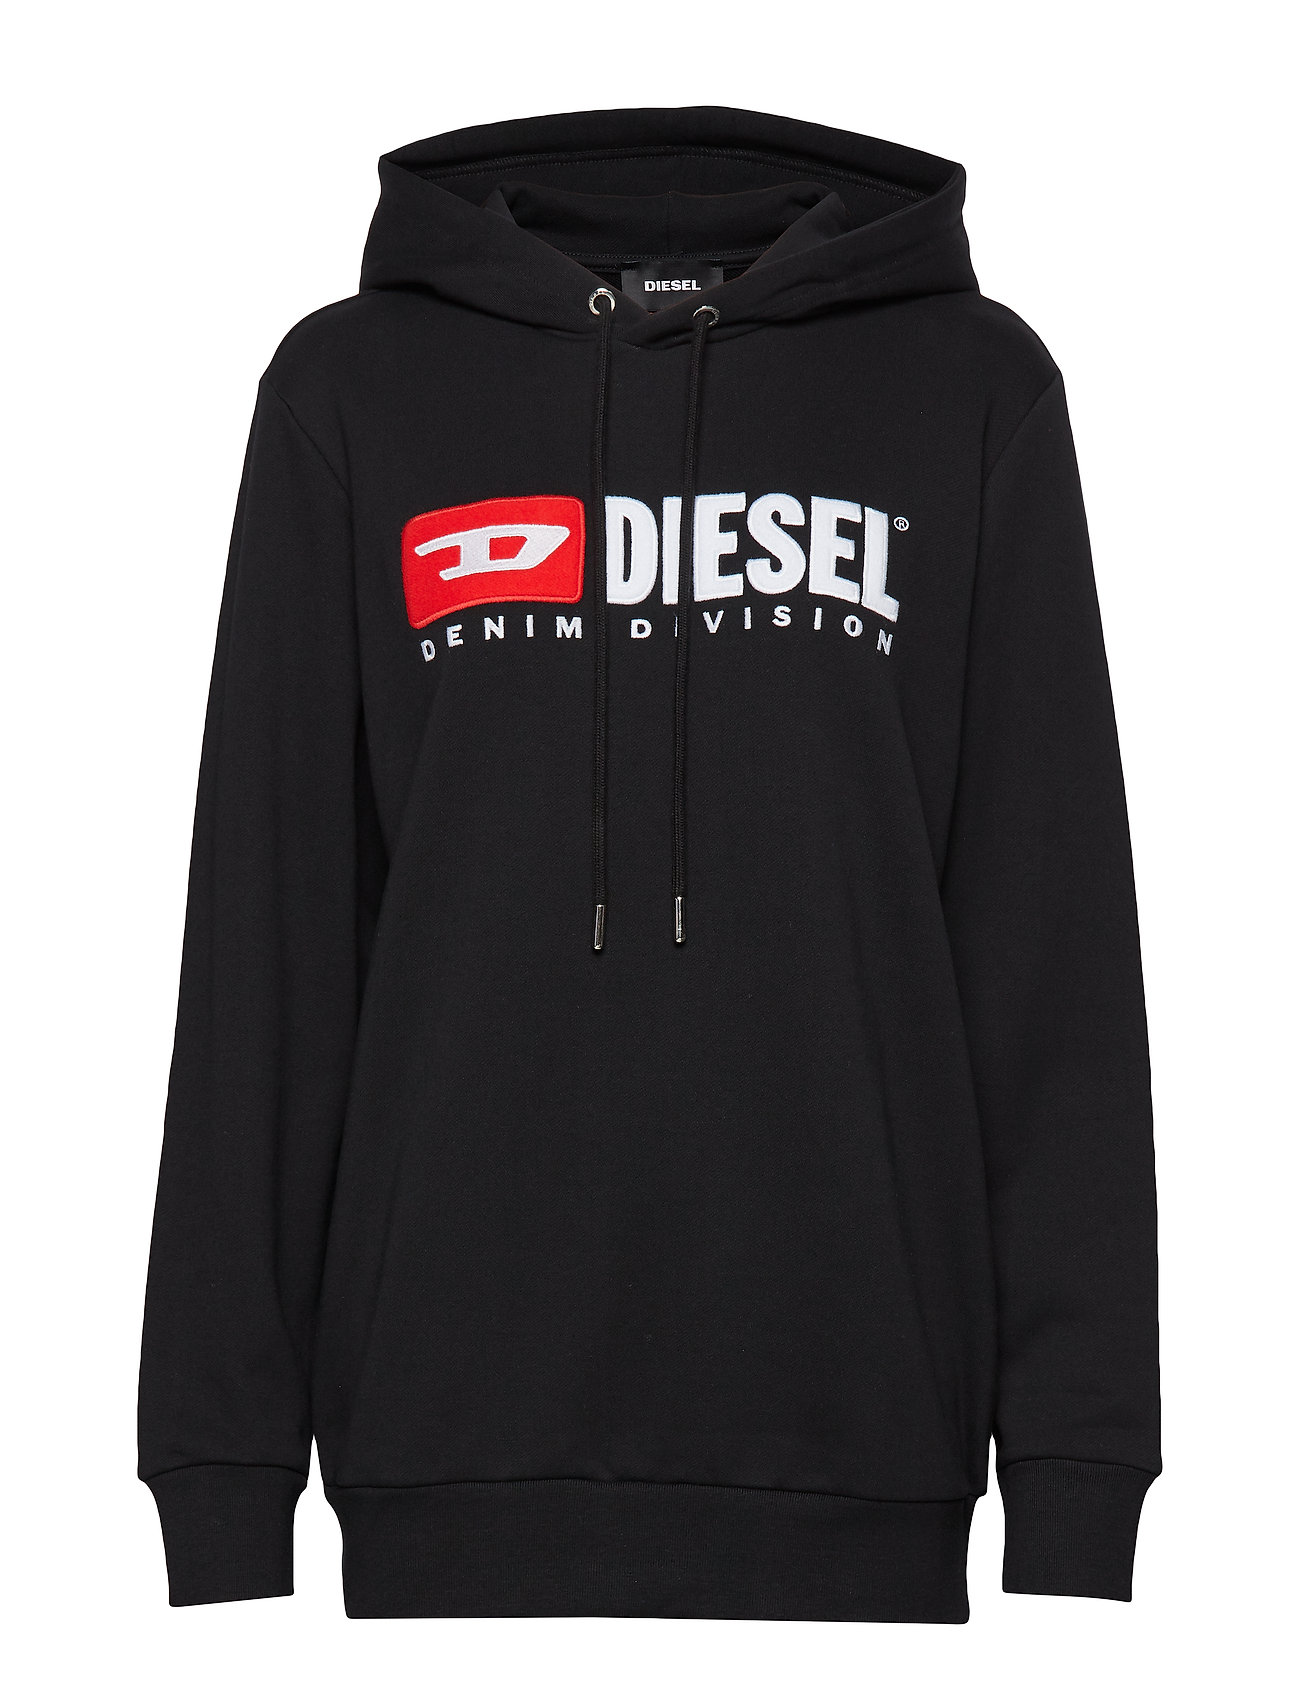 DIESEL F-Gir-Hood-Division-Fl Sweat-Shirt Hoodie Pullover Schwarz DIESEL WOMEN